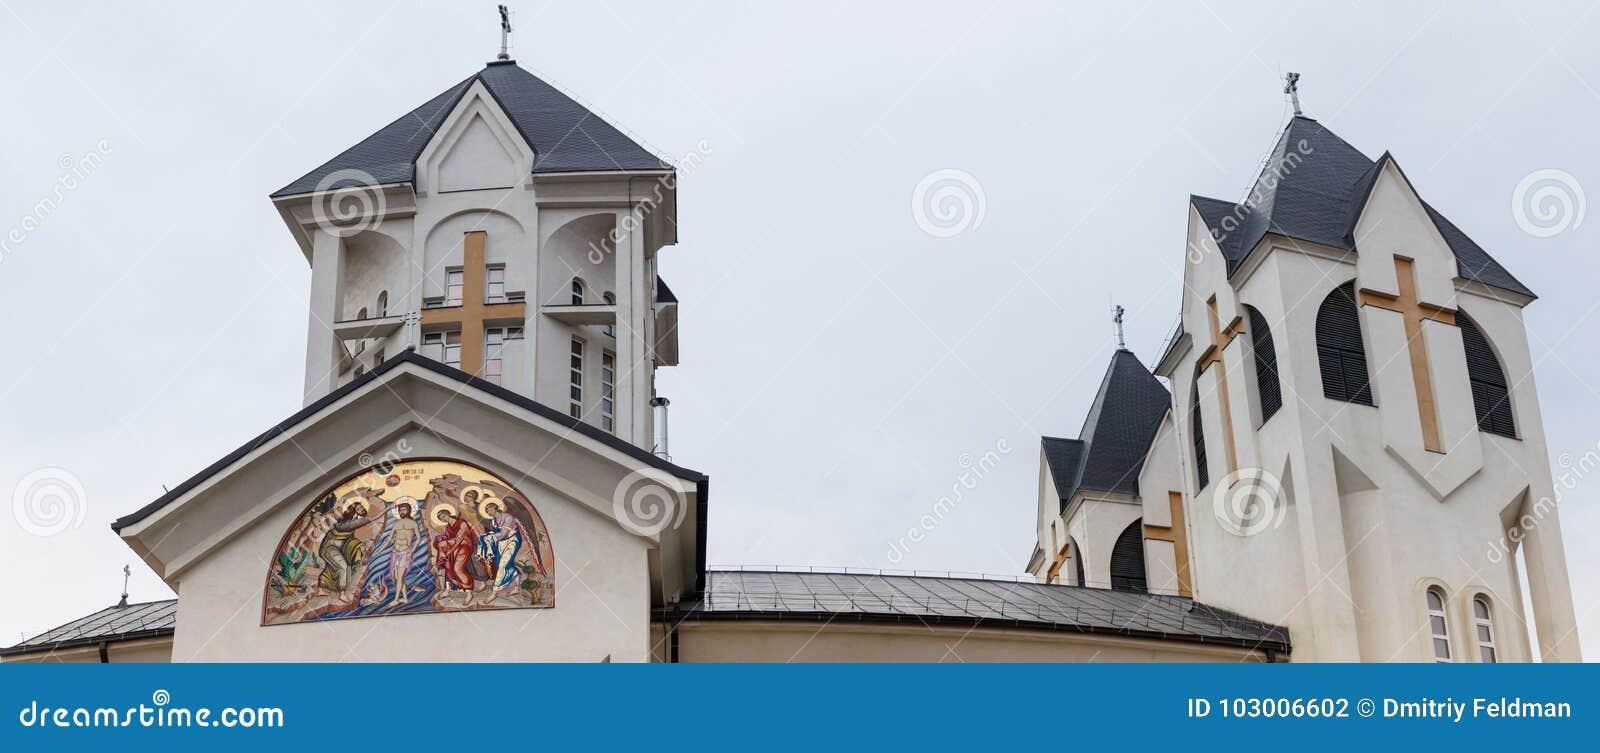 Chiesa ortodossa degli imperatori santi Costantina e Helena su Alexandru Odobescu Street nella città di Brasov in Romania